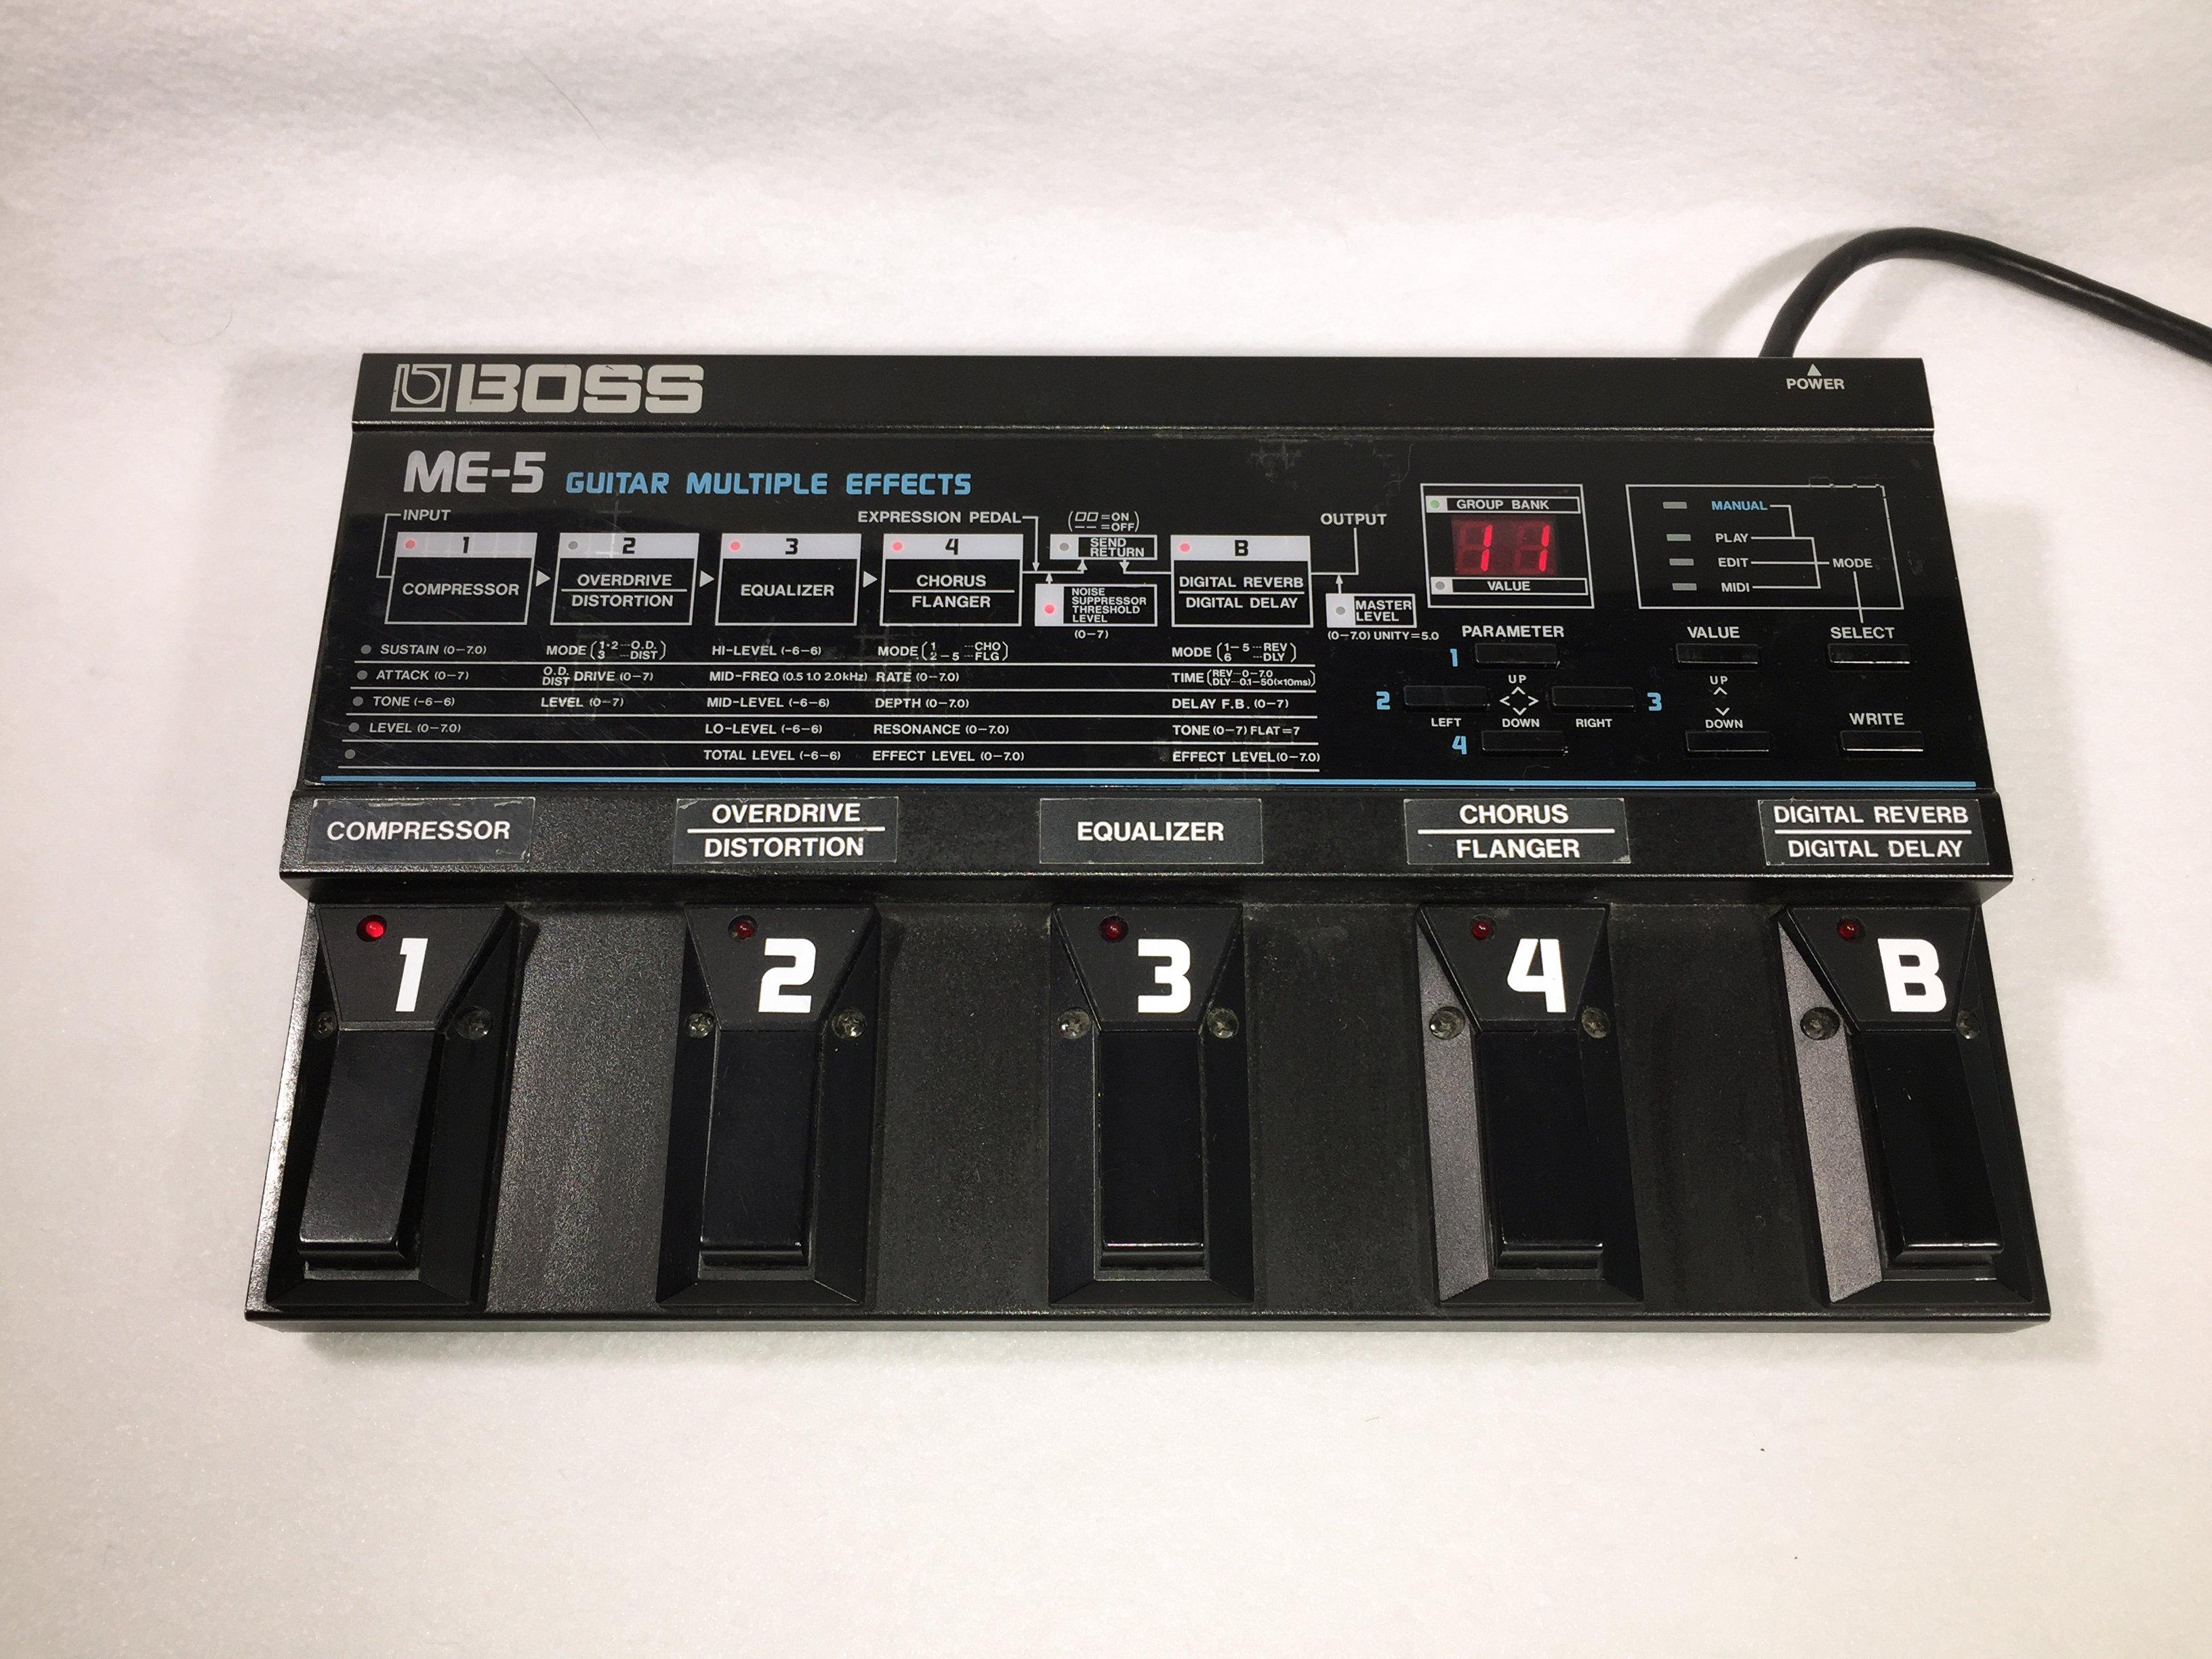 boss me 5 guitar multiple effects pedal electric denim studios. Black Bedroom Furniture Sets. Home Design Ideas